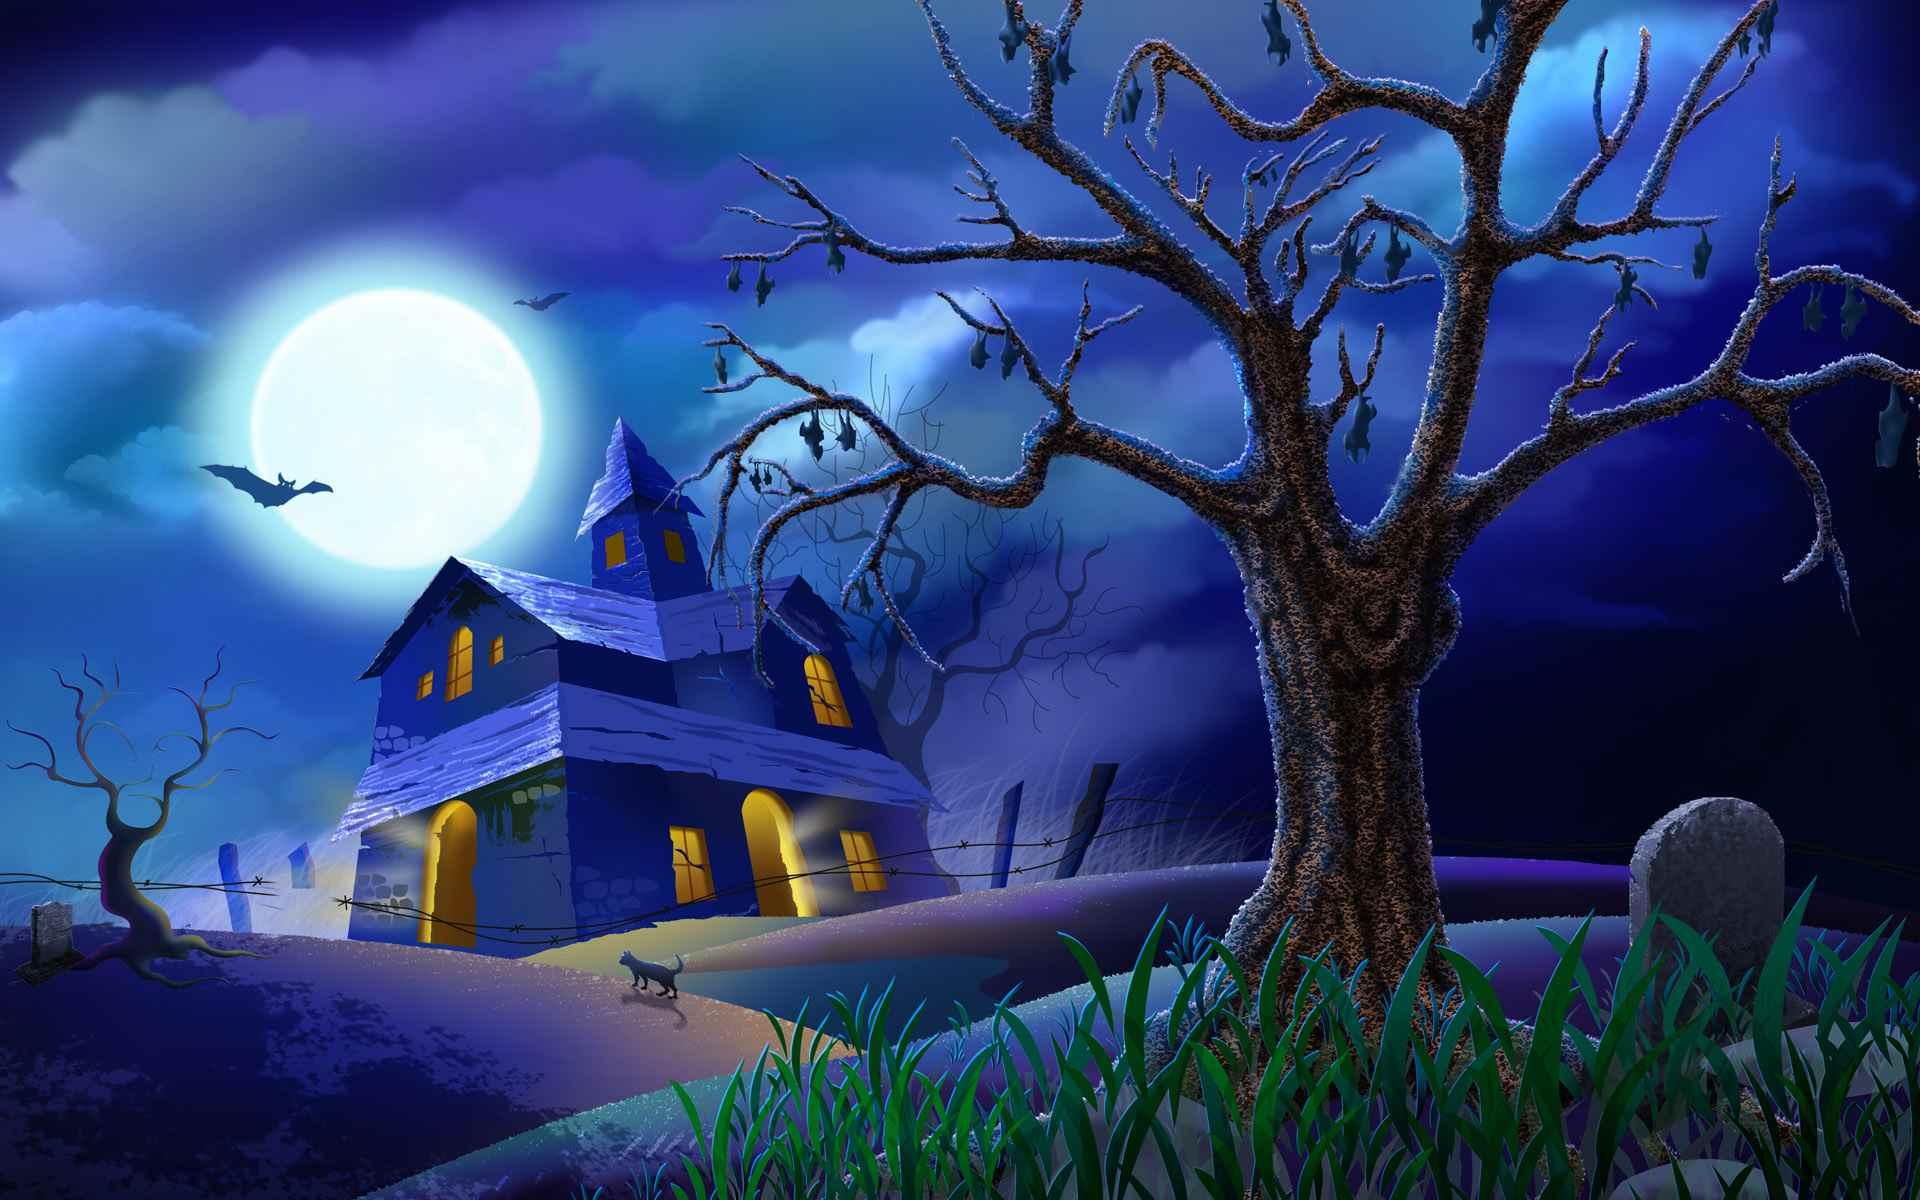 A haunted house on a dark night.